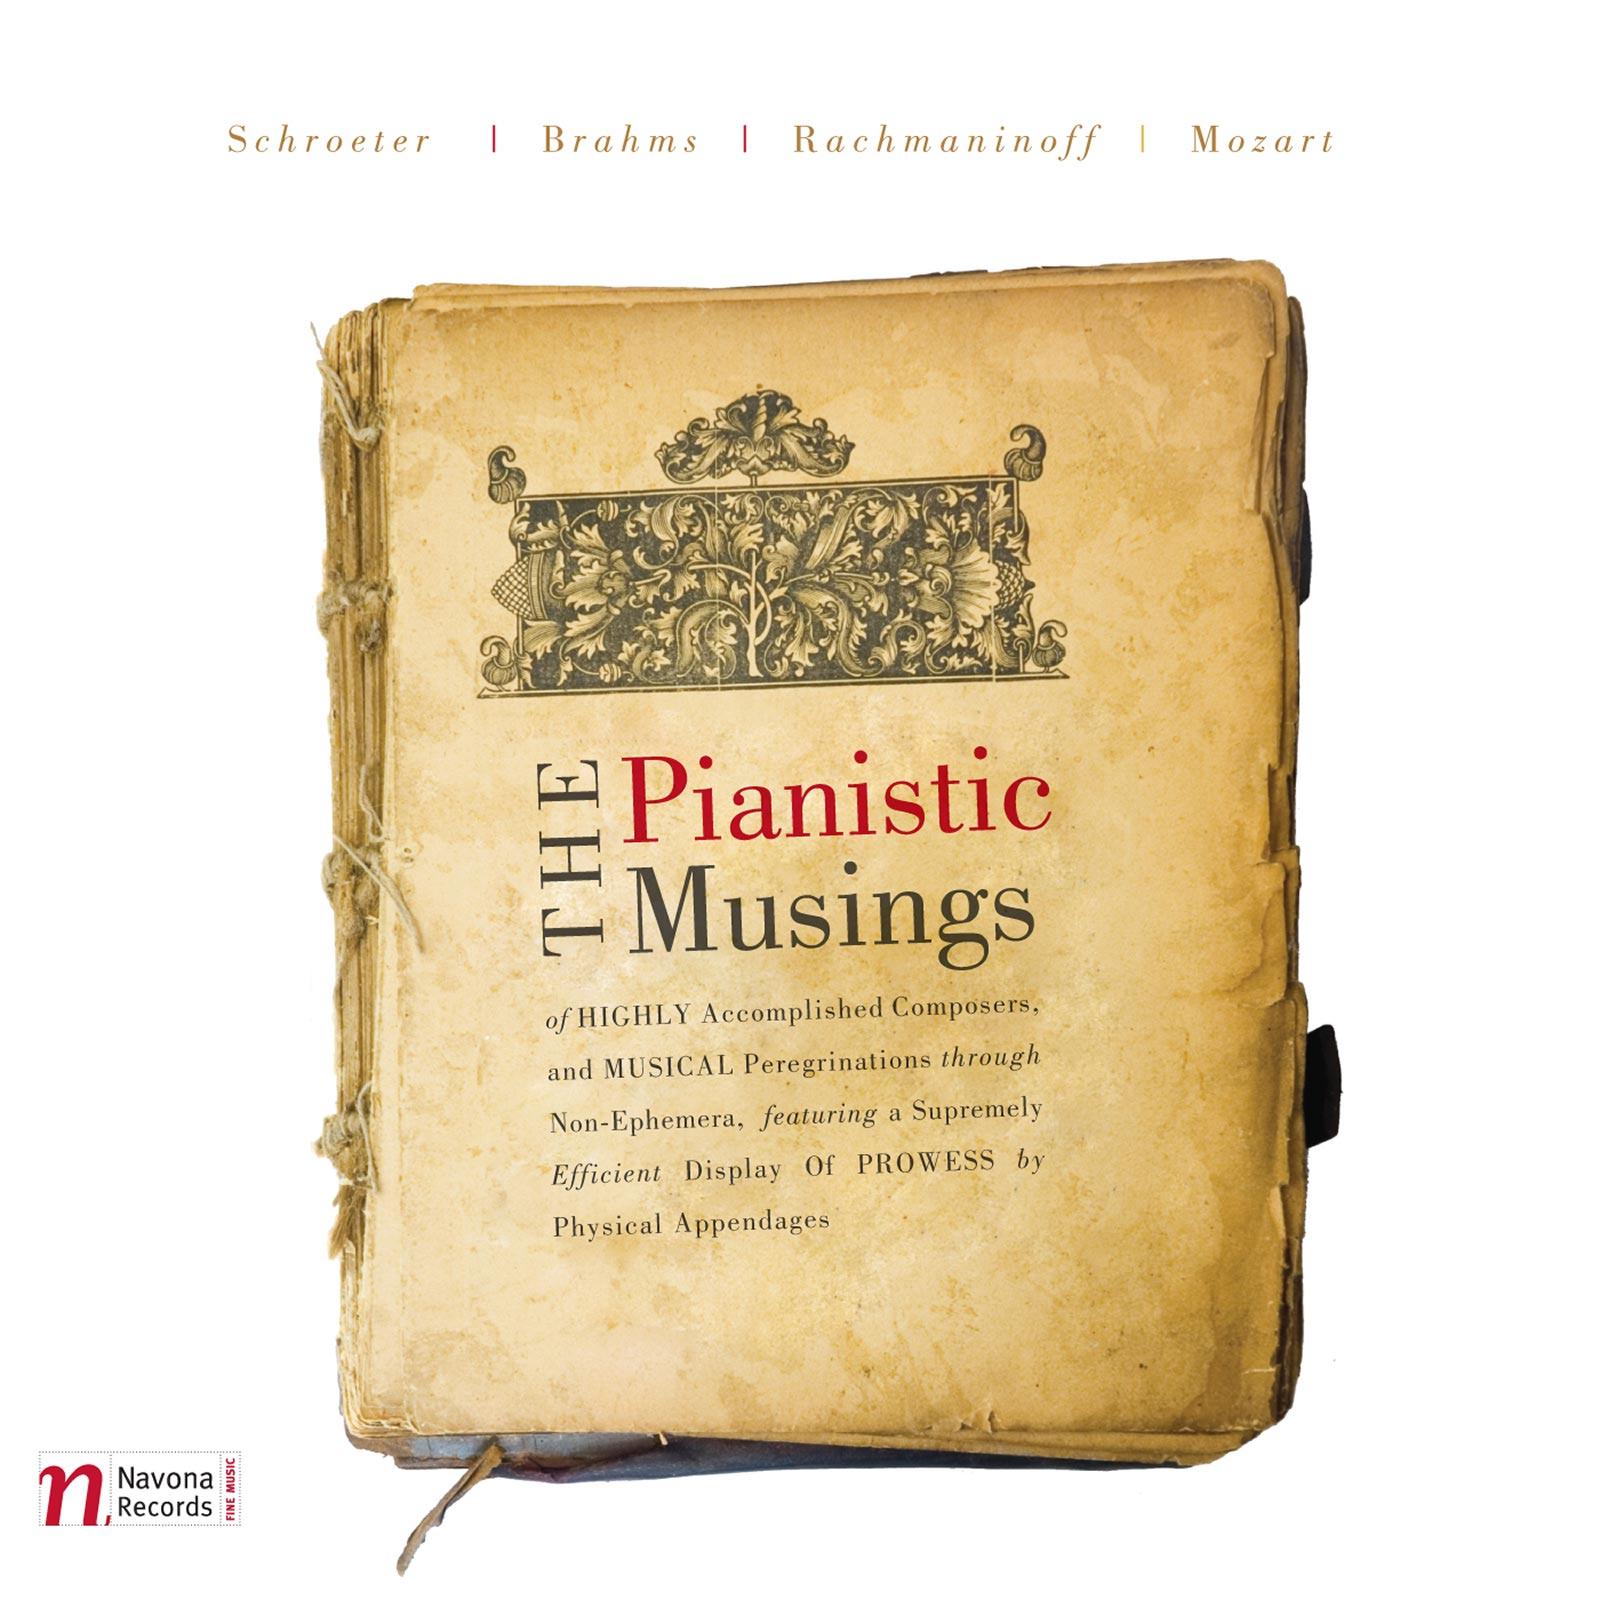 The Pianistic Musings